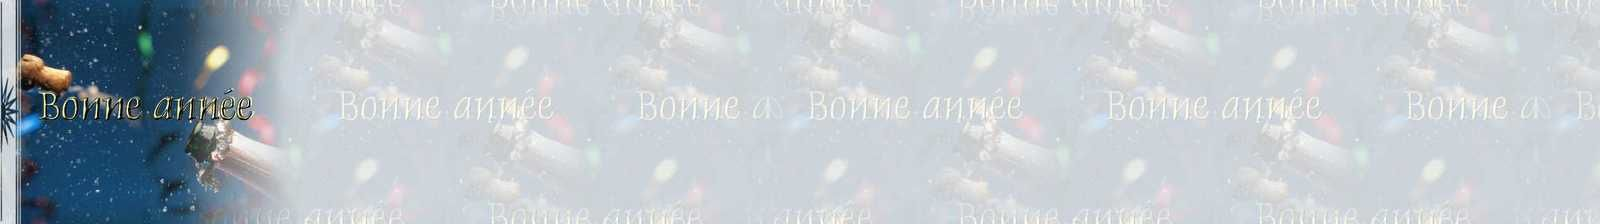 Bonne année Incredimail &amp&#x3B; Papier A4 h l &amp&#x3B; outlook &amp&#x3B; enveloppe &amp&#x3B; 2 cartes A5 &amp&#x3B; signets    bonne_annee_nouvelan1_00